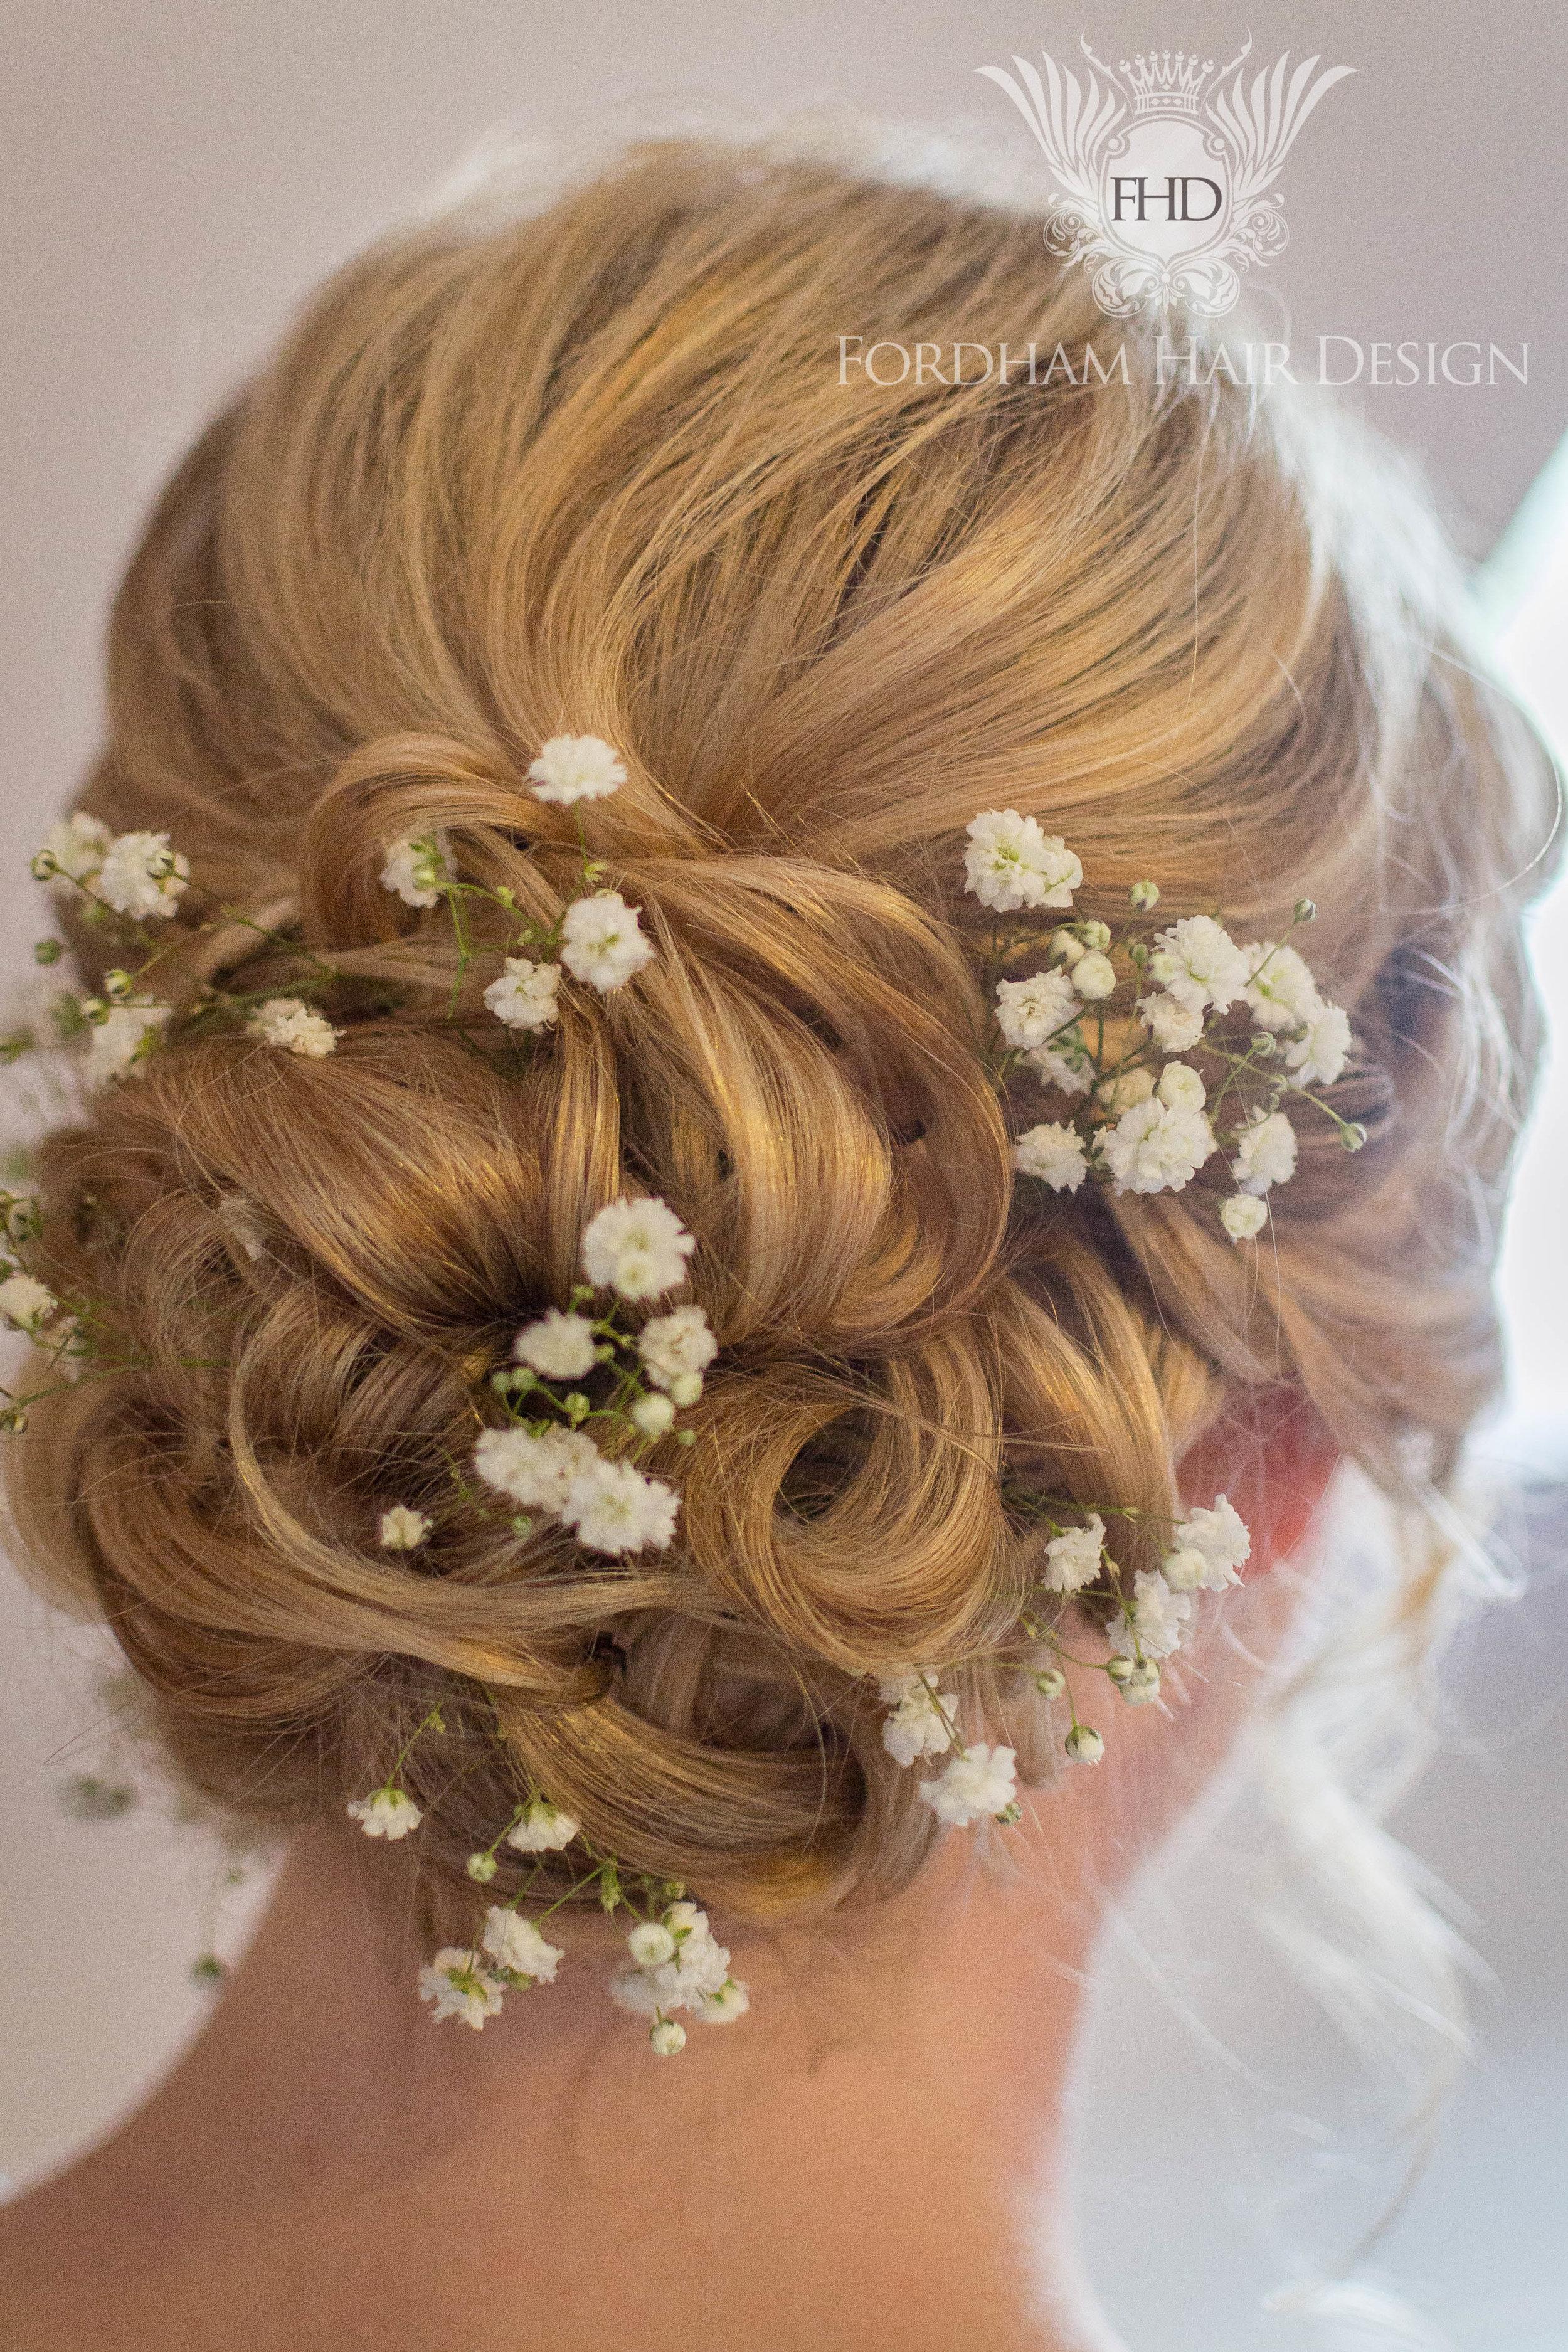 Tousled wedding hair